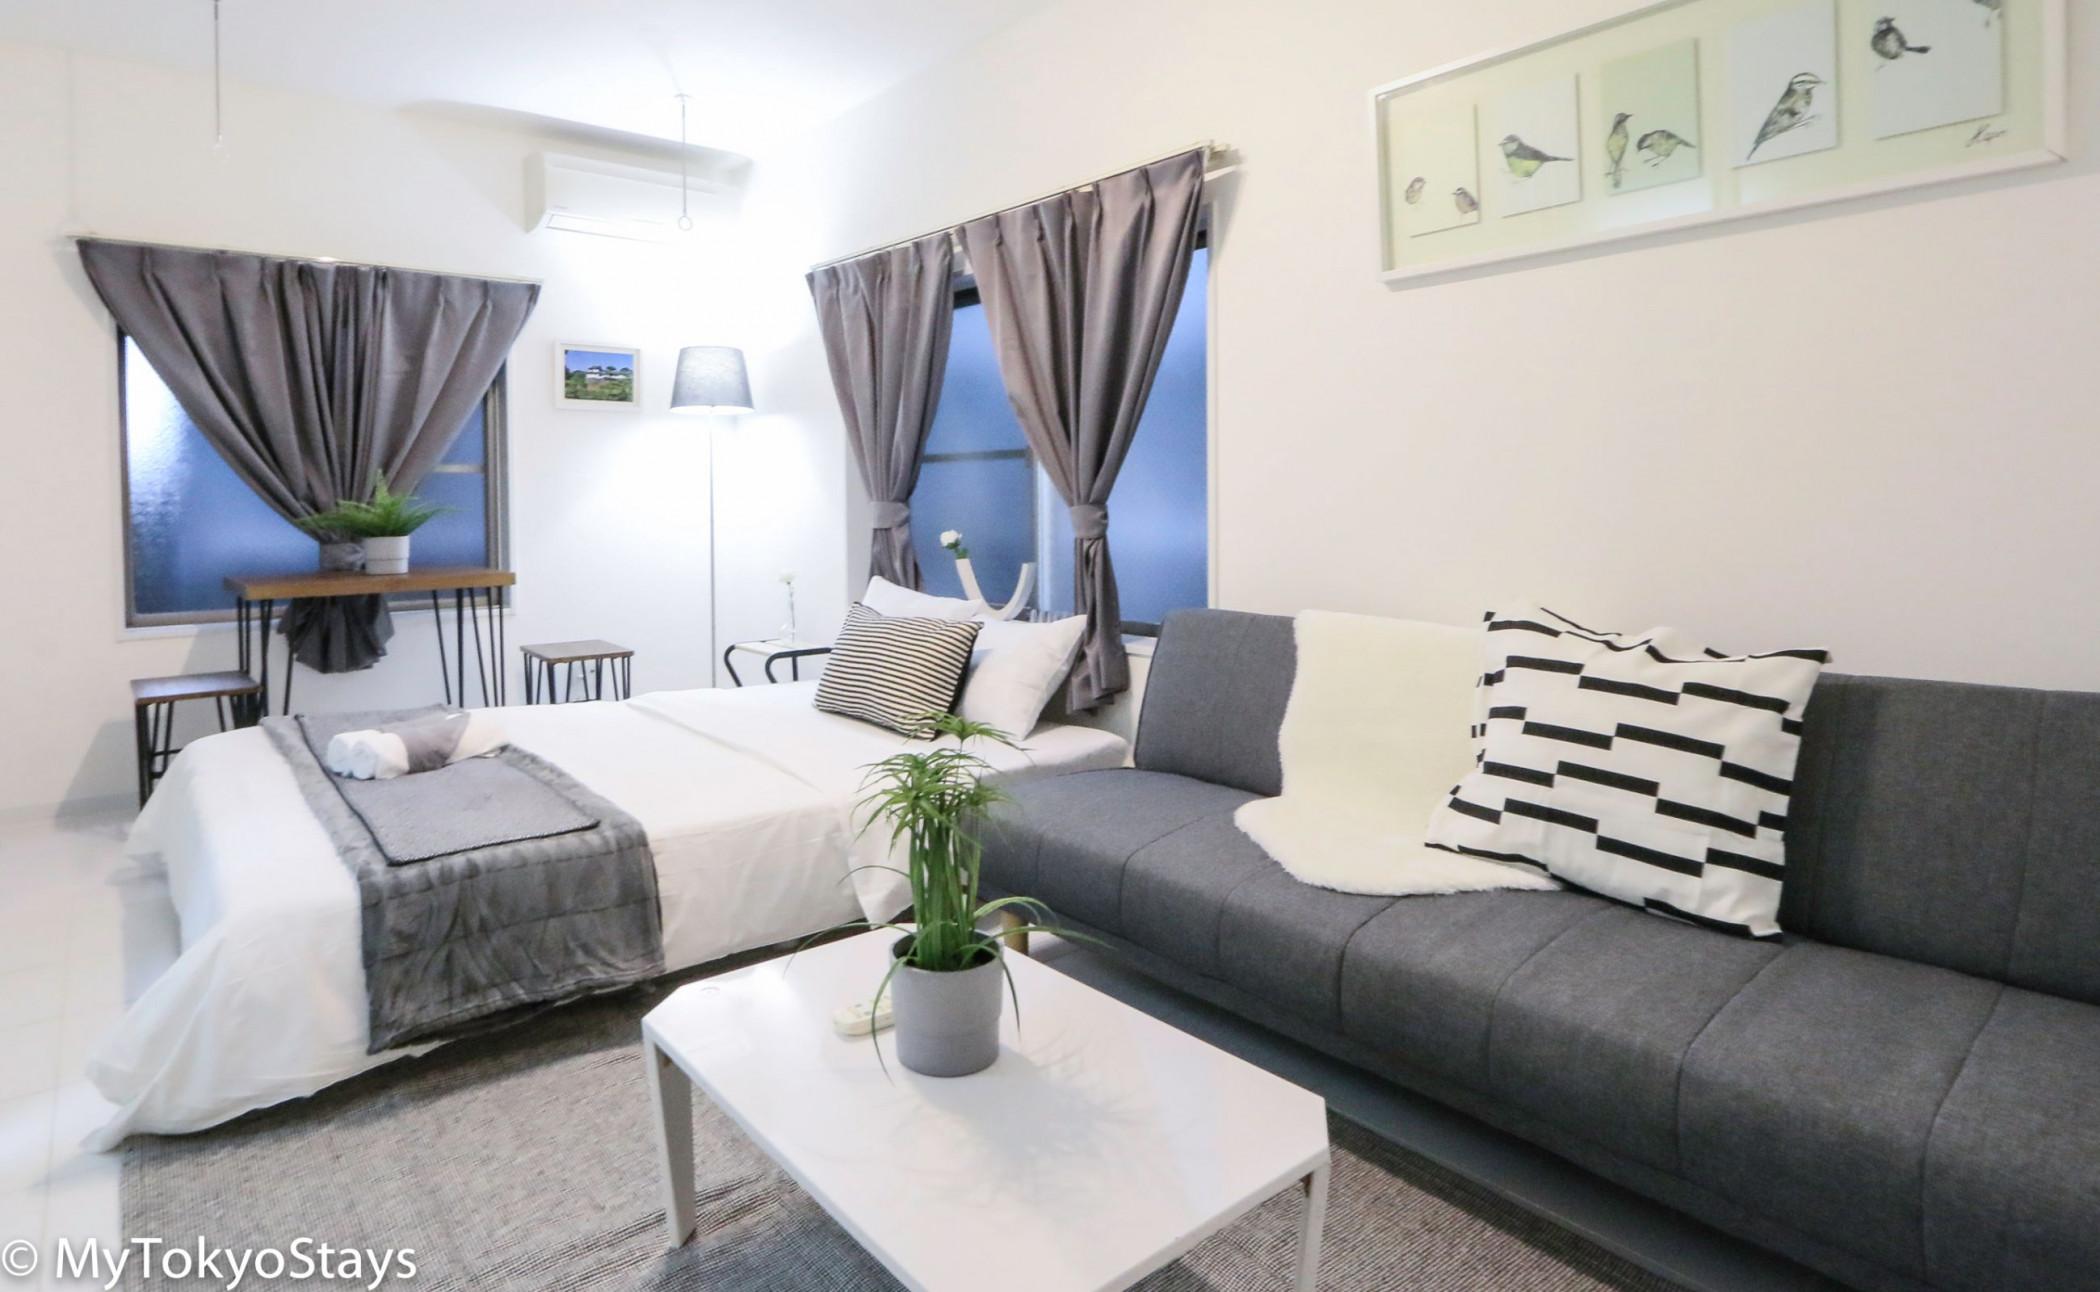 1 Bedroom Aparment Kamiyamacho AF12